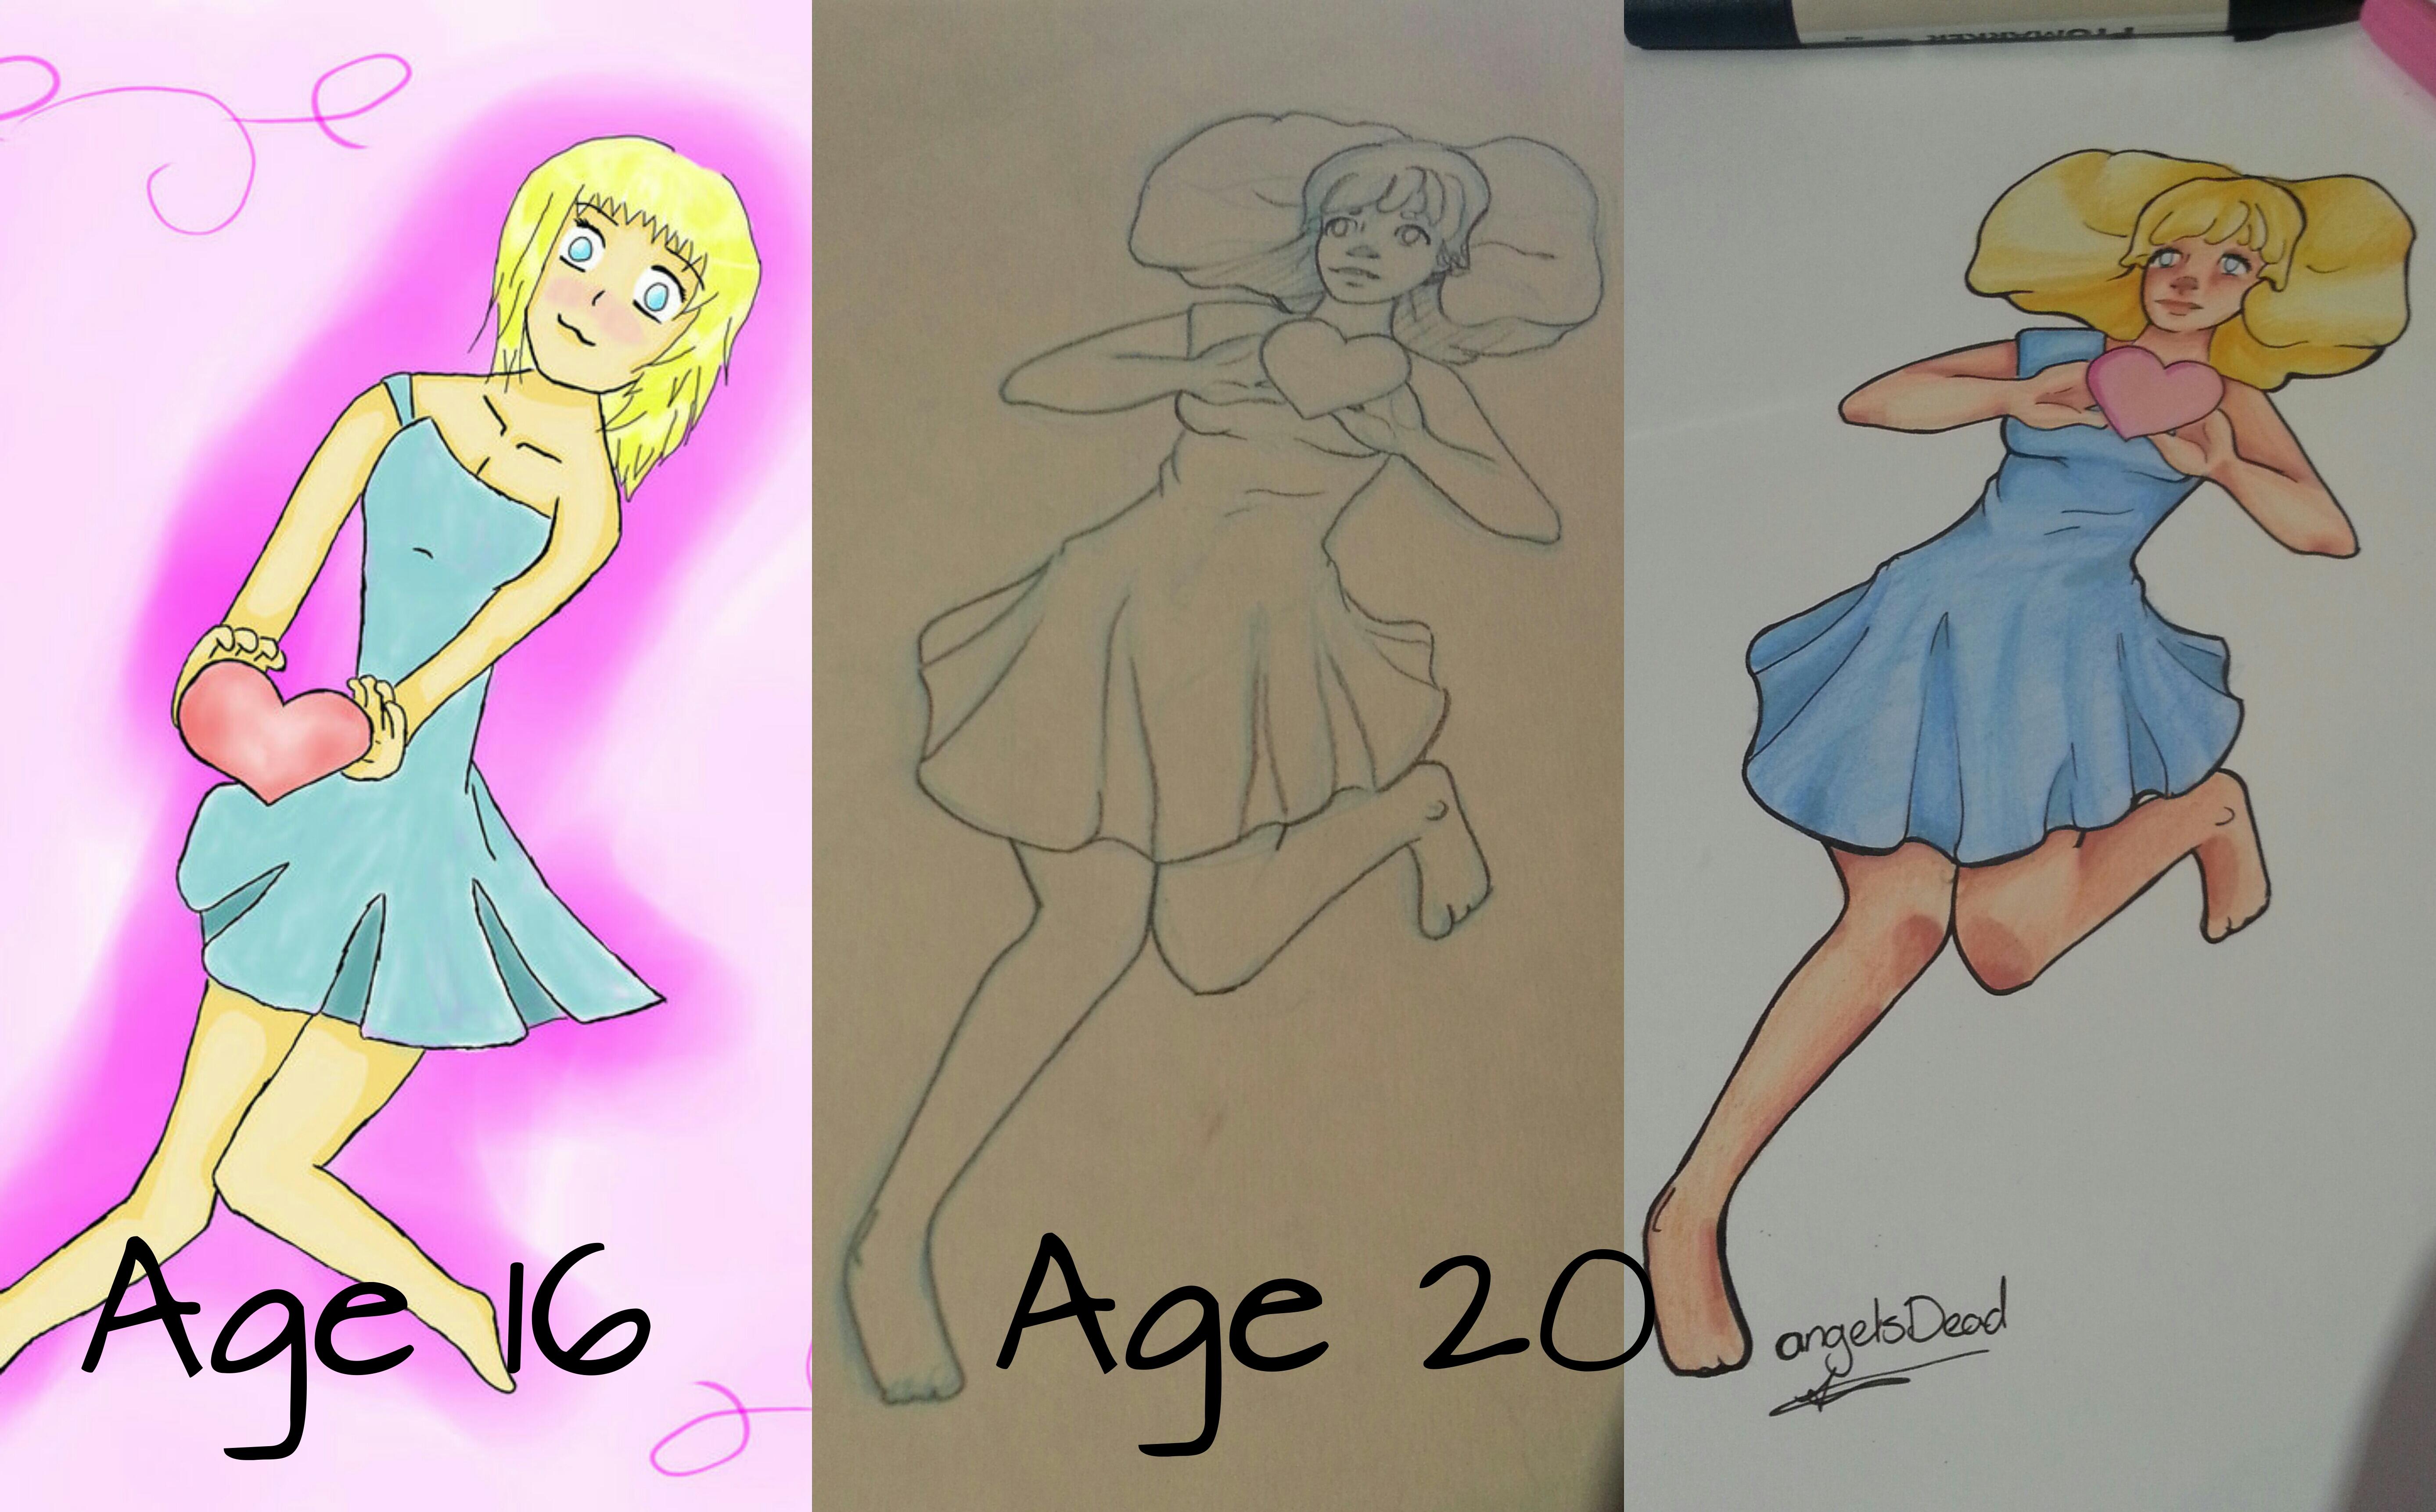 Improvement of 4 years